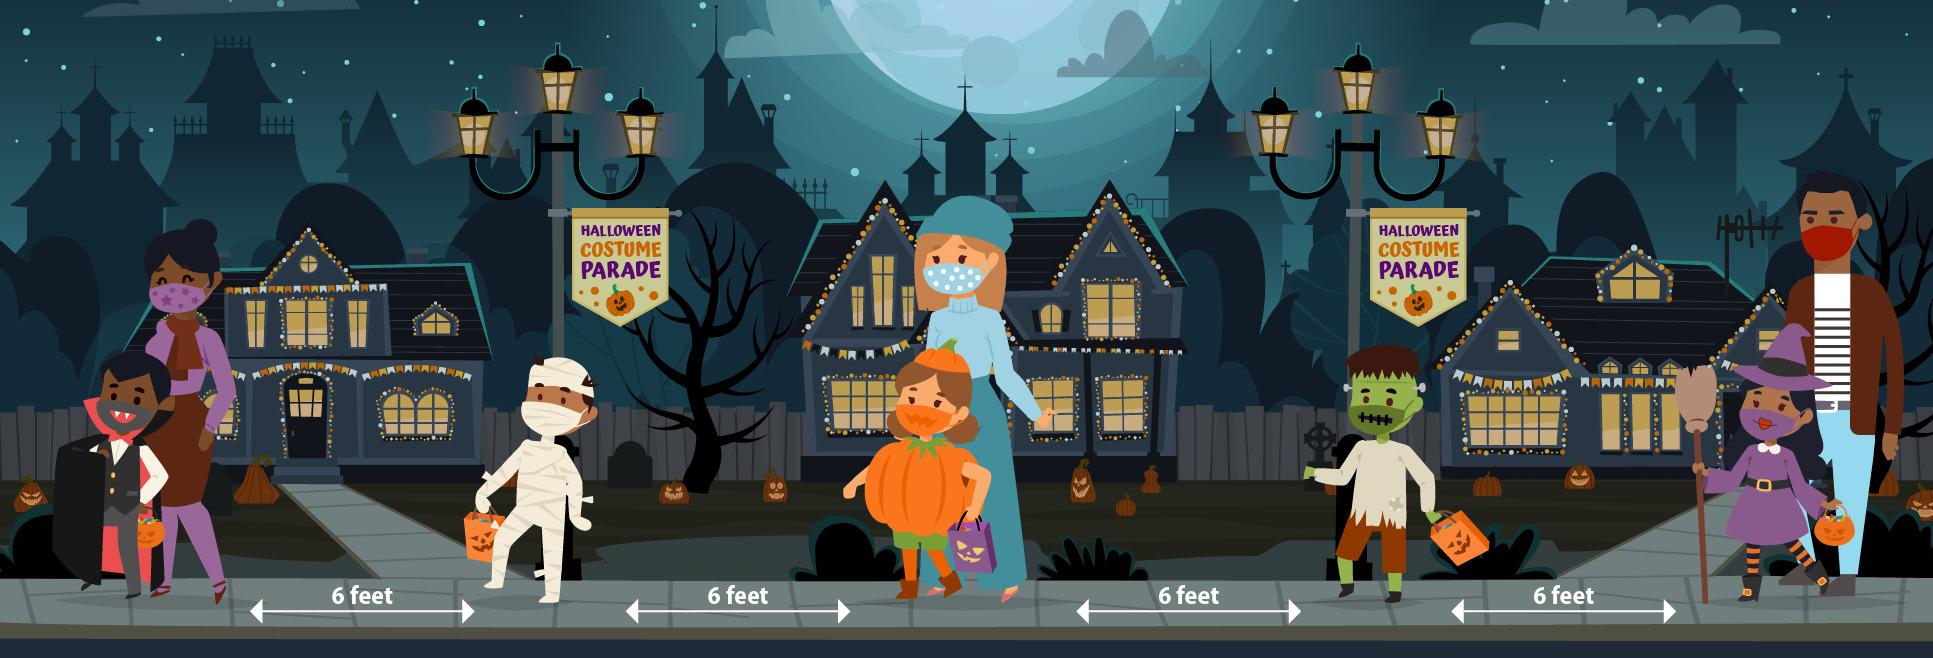 CDC Halloween COVID Tips